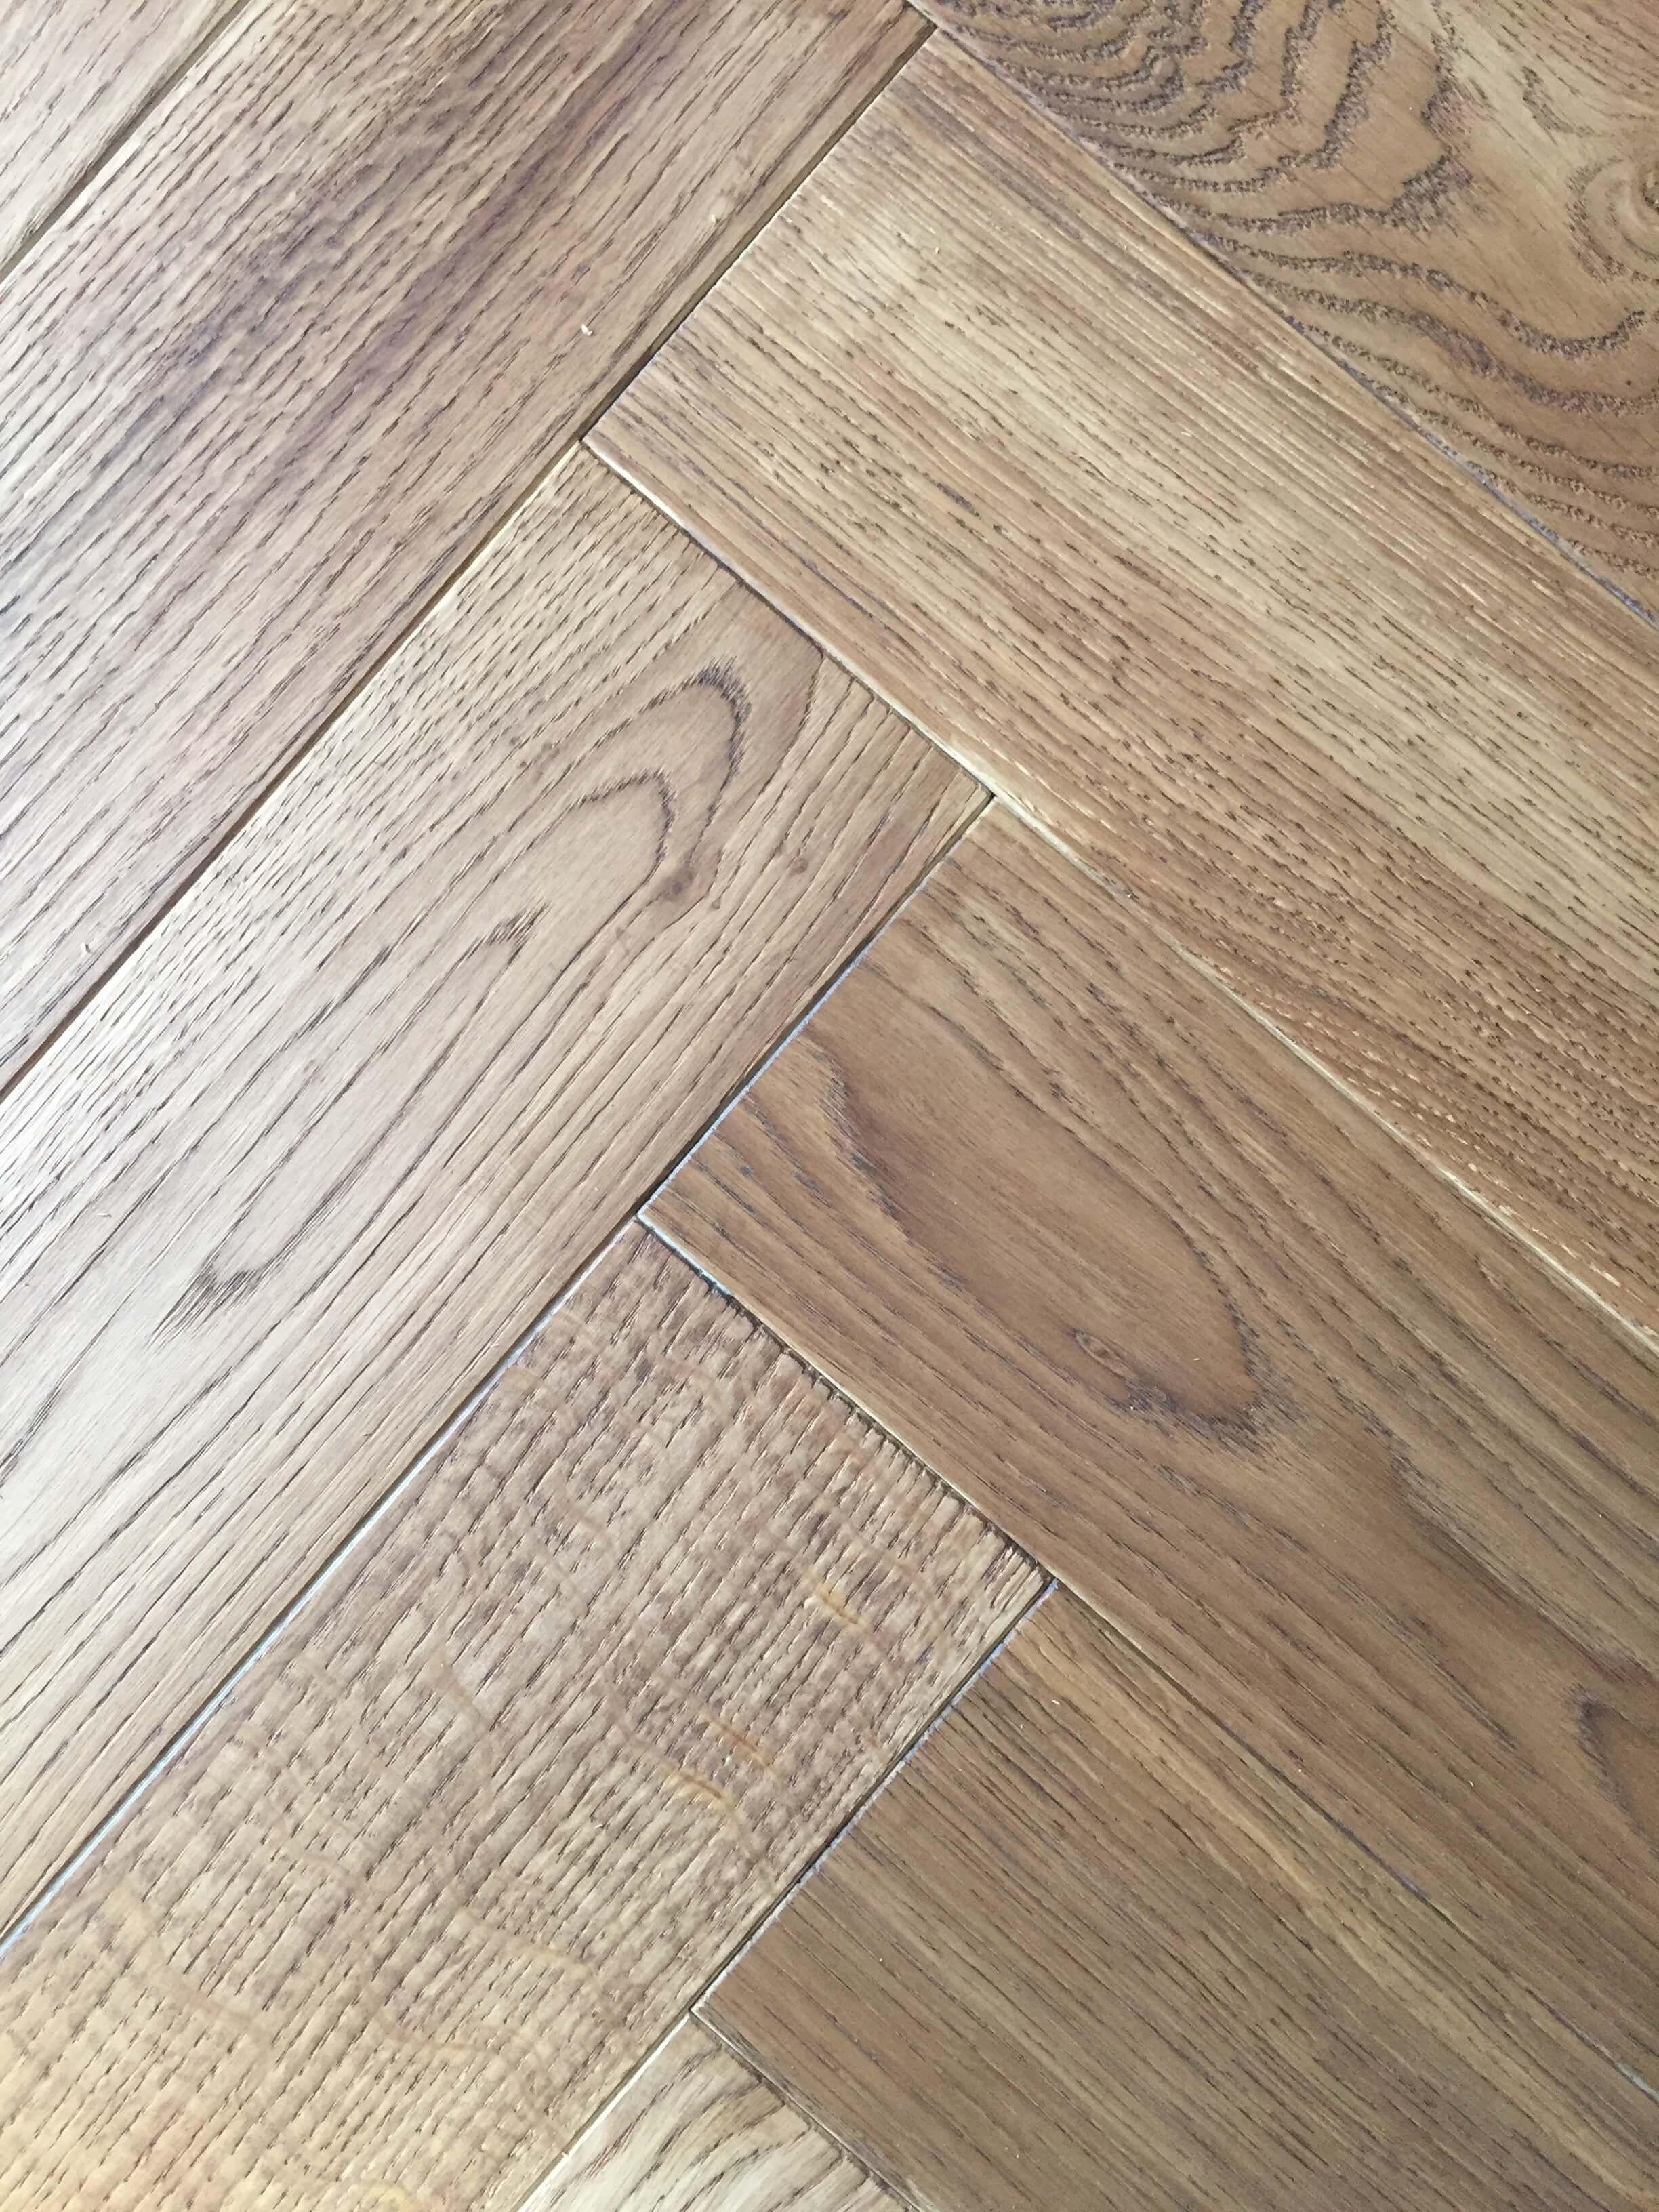 hardwood flooring sale in mississauga of handscraped engineered hardwood awesome engineered wood flooring in handscraped engineered hardwood awesome engineered wood flooring brown maple hand scraped engineered images